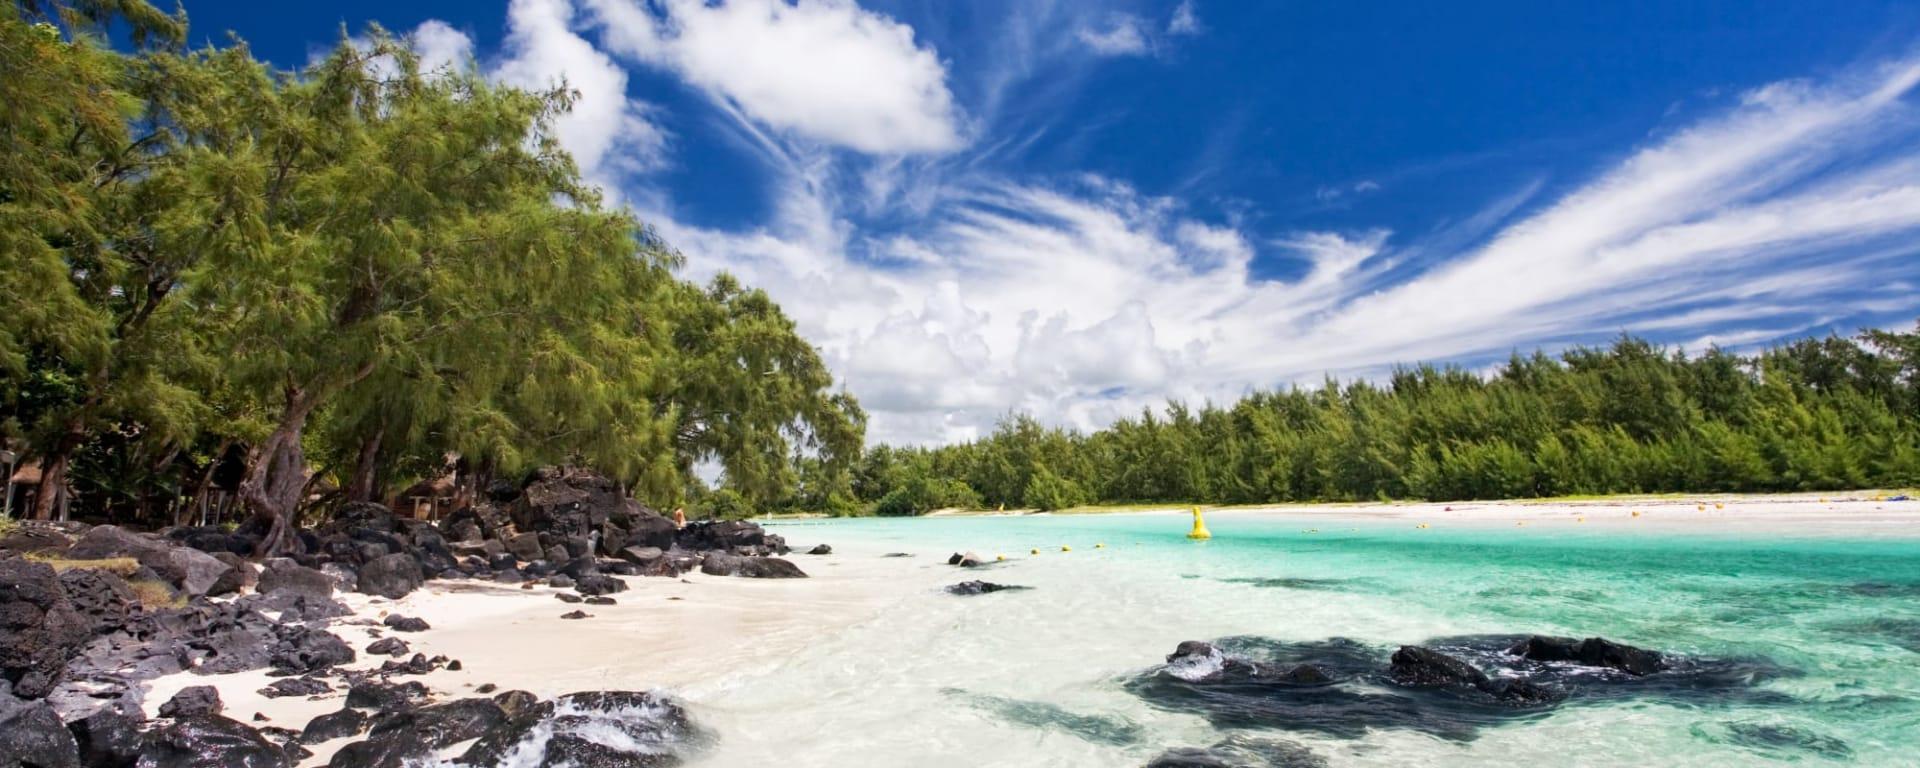 Ile aux Cerfs, DE/EN/FR, Ganztägig in Osten: Mauritius Ile aux Cerfs